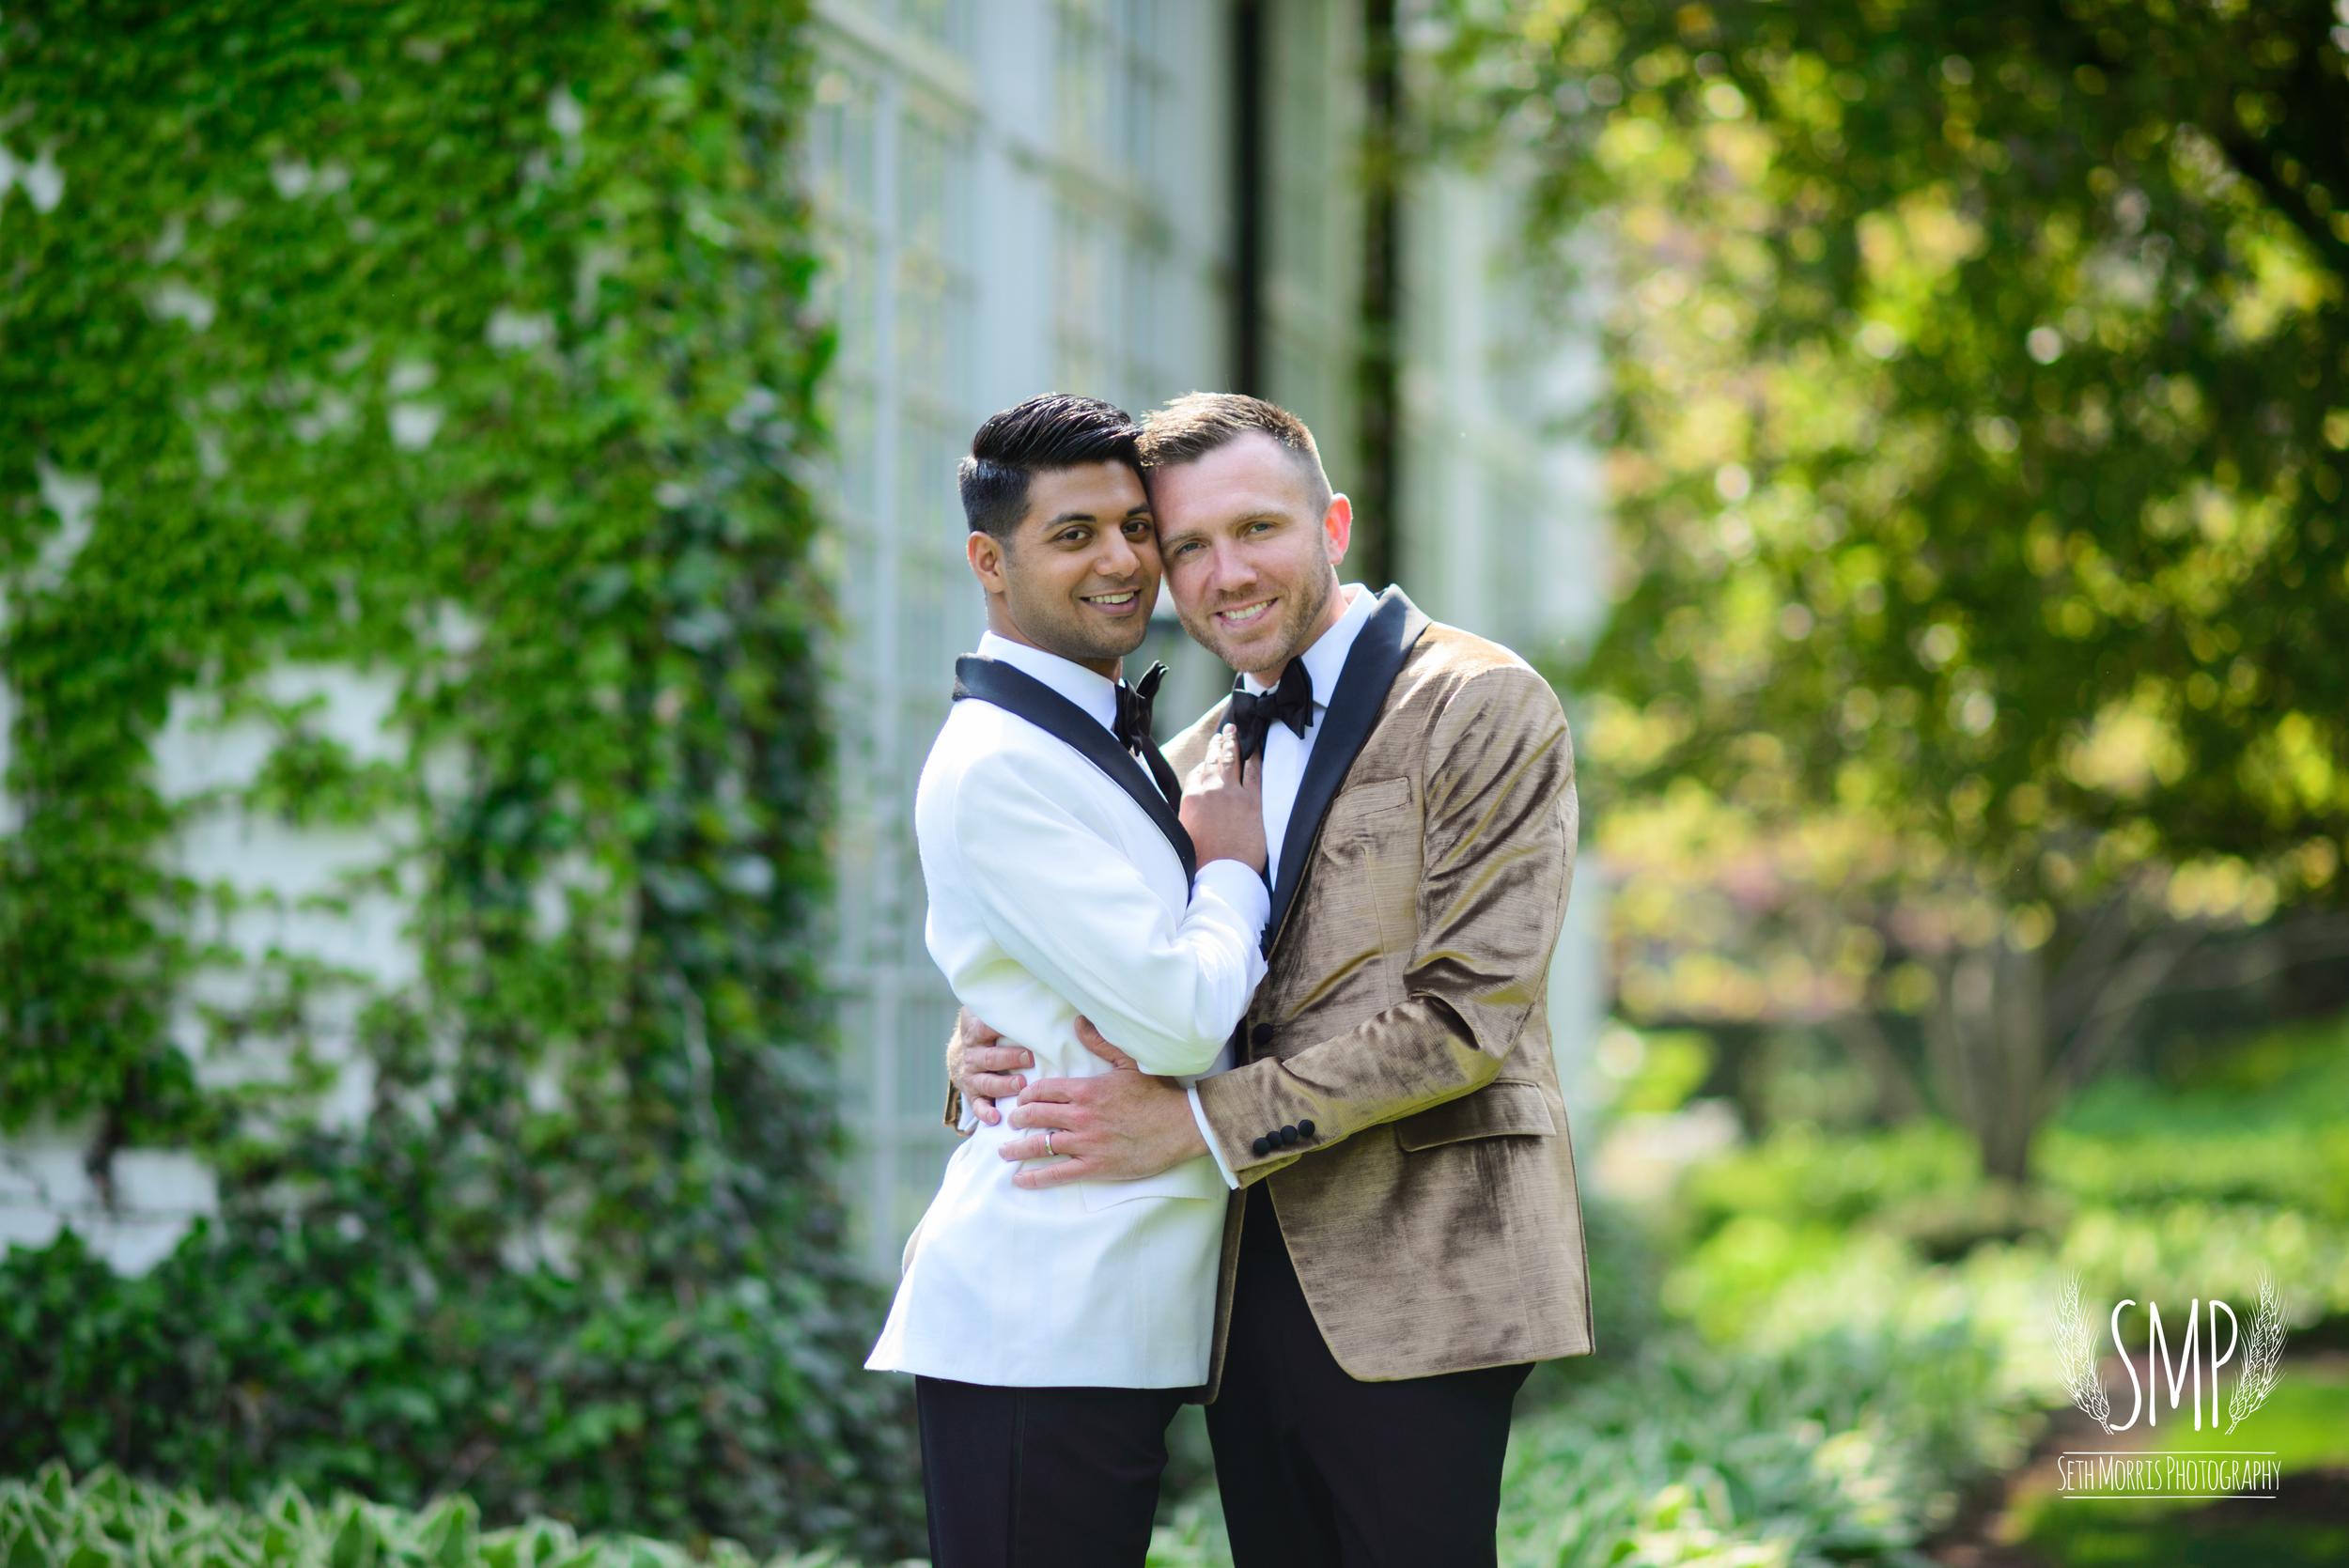 same-sex-wedding-photographer-chicago-illinois-22.jpg